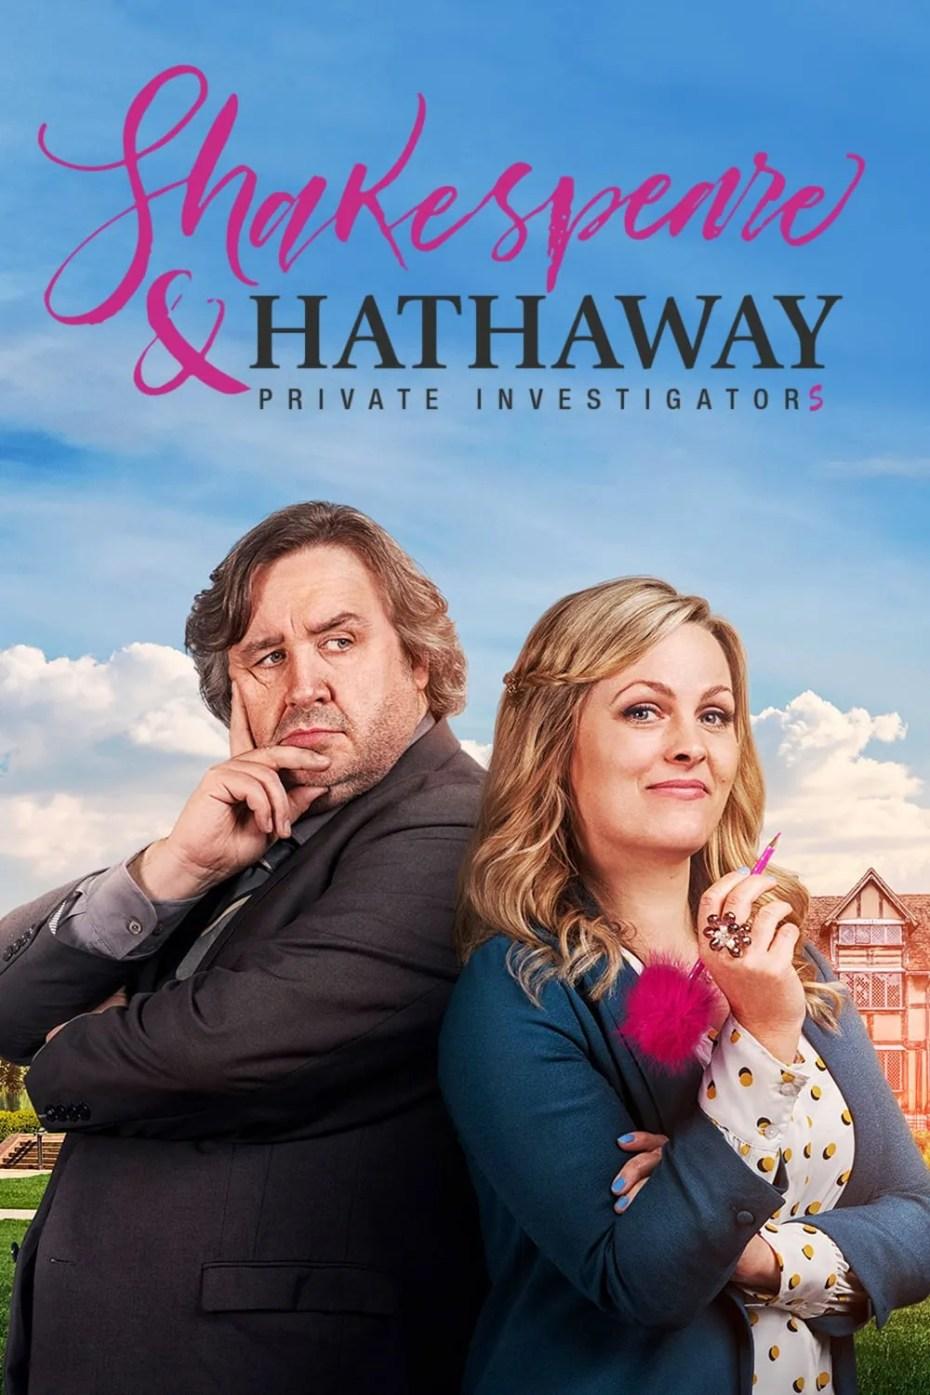 Shakespeare & Hathaway Private Investigators